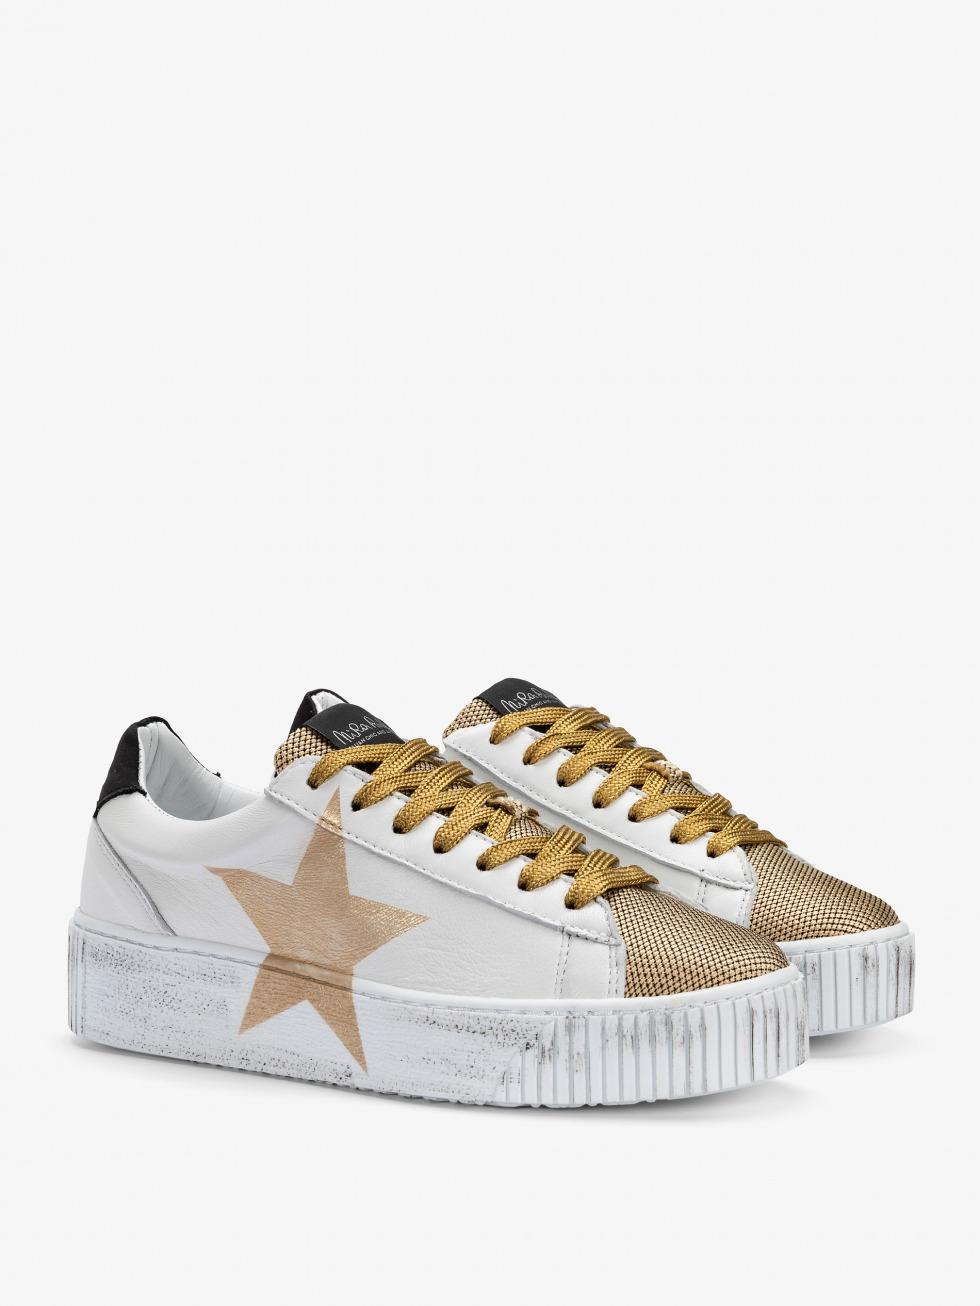 Cosmopolitan Sneakers - Gold Satin Star